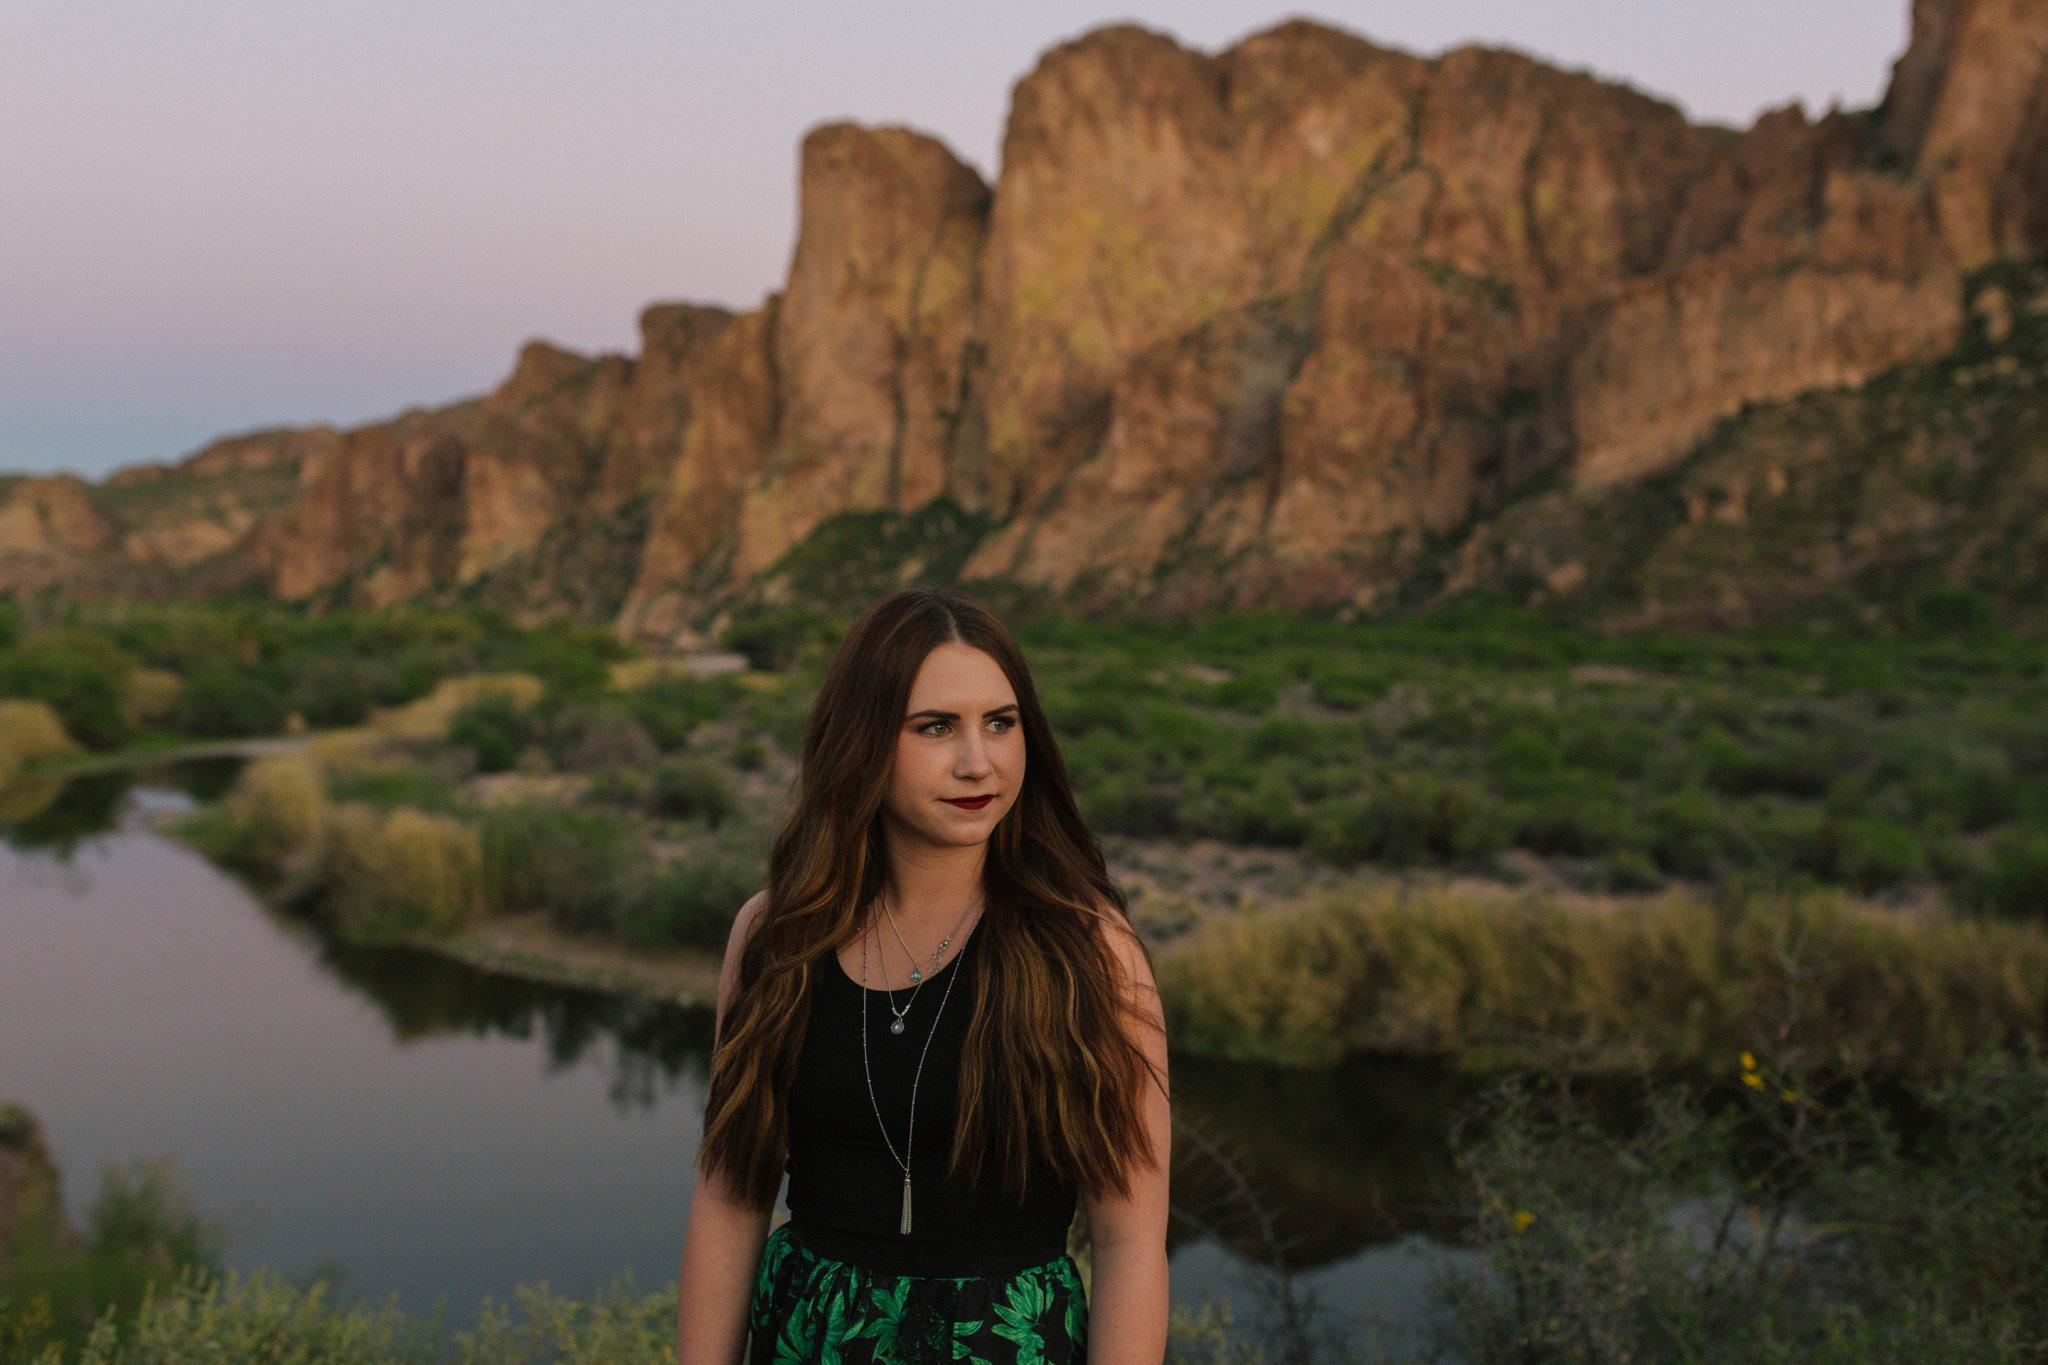 Arizona outdoor high school senior photography